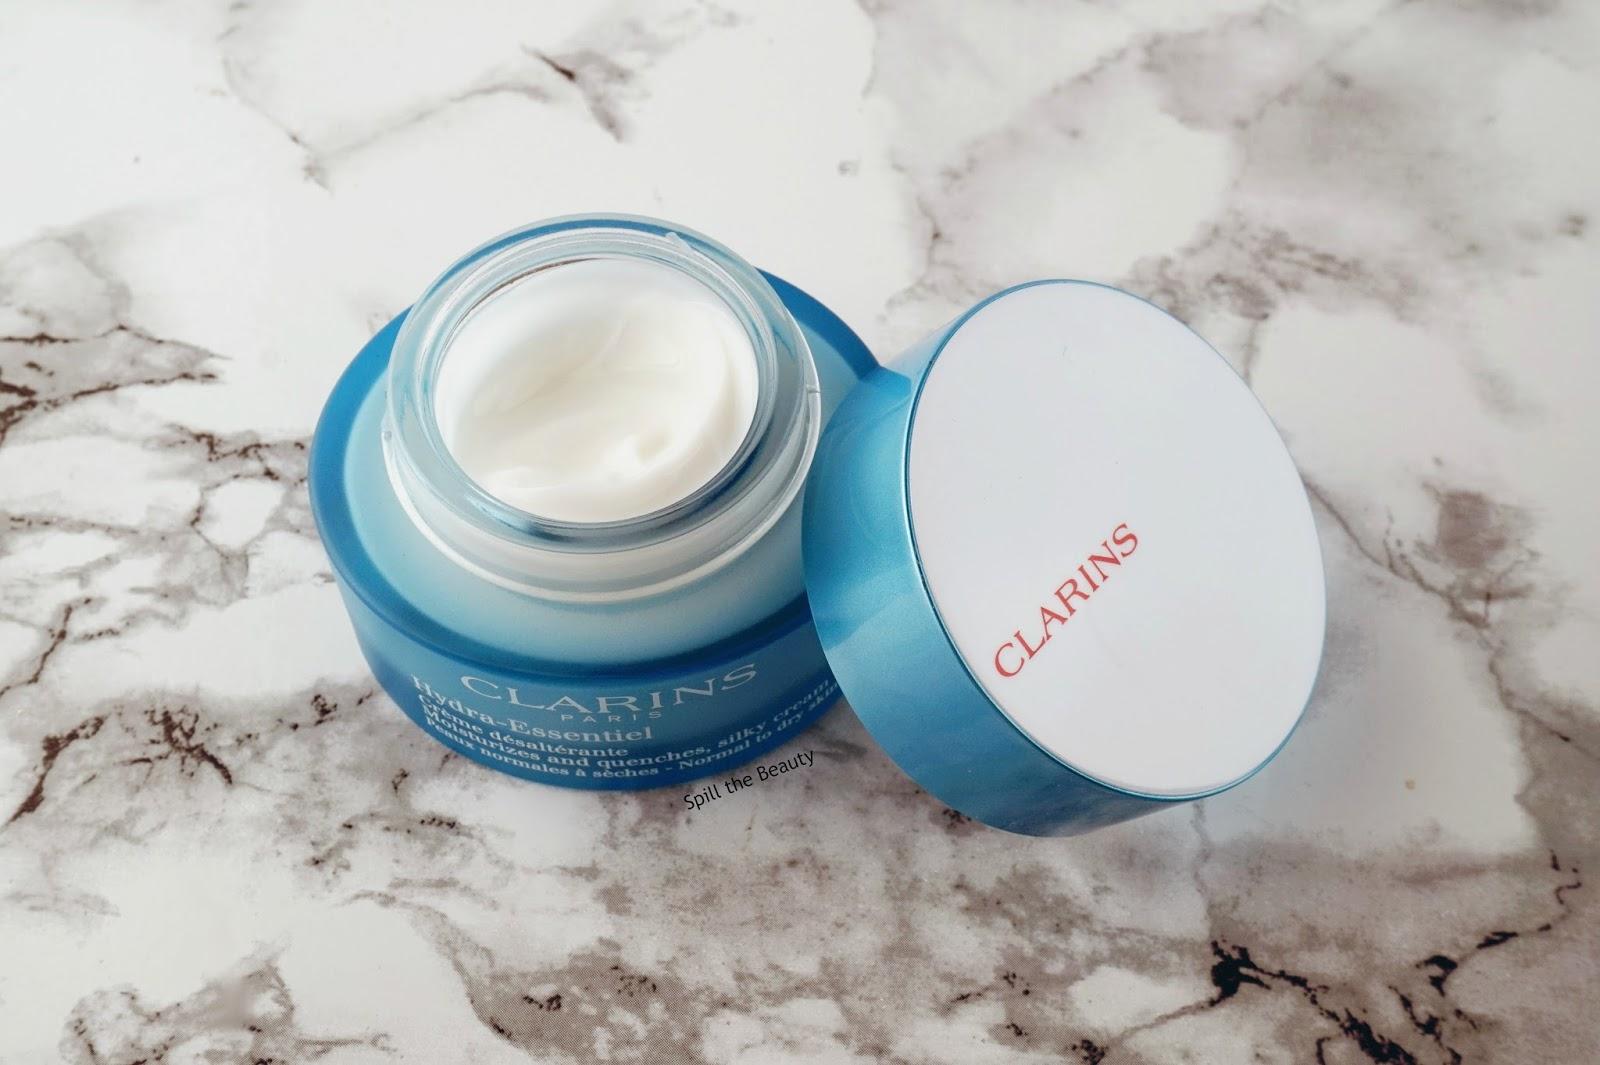 clarins hydra essentiel bi phase serum silky cream skincare review